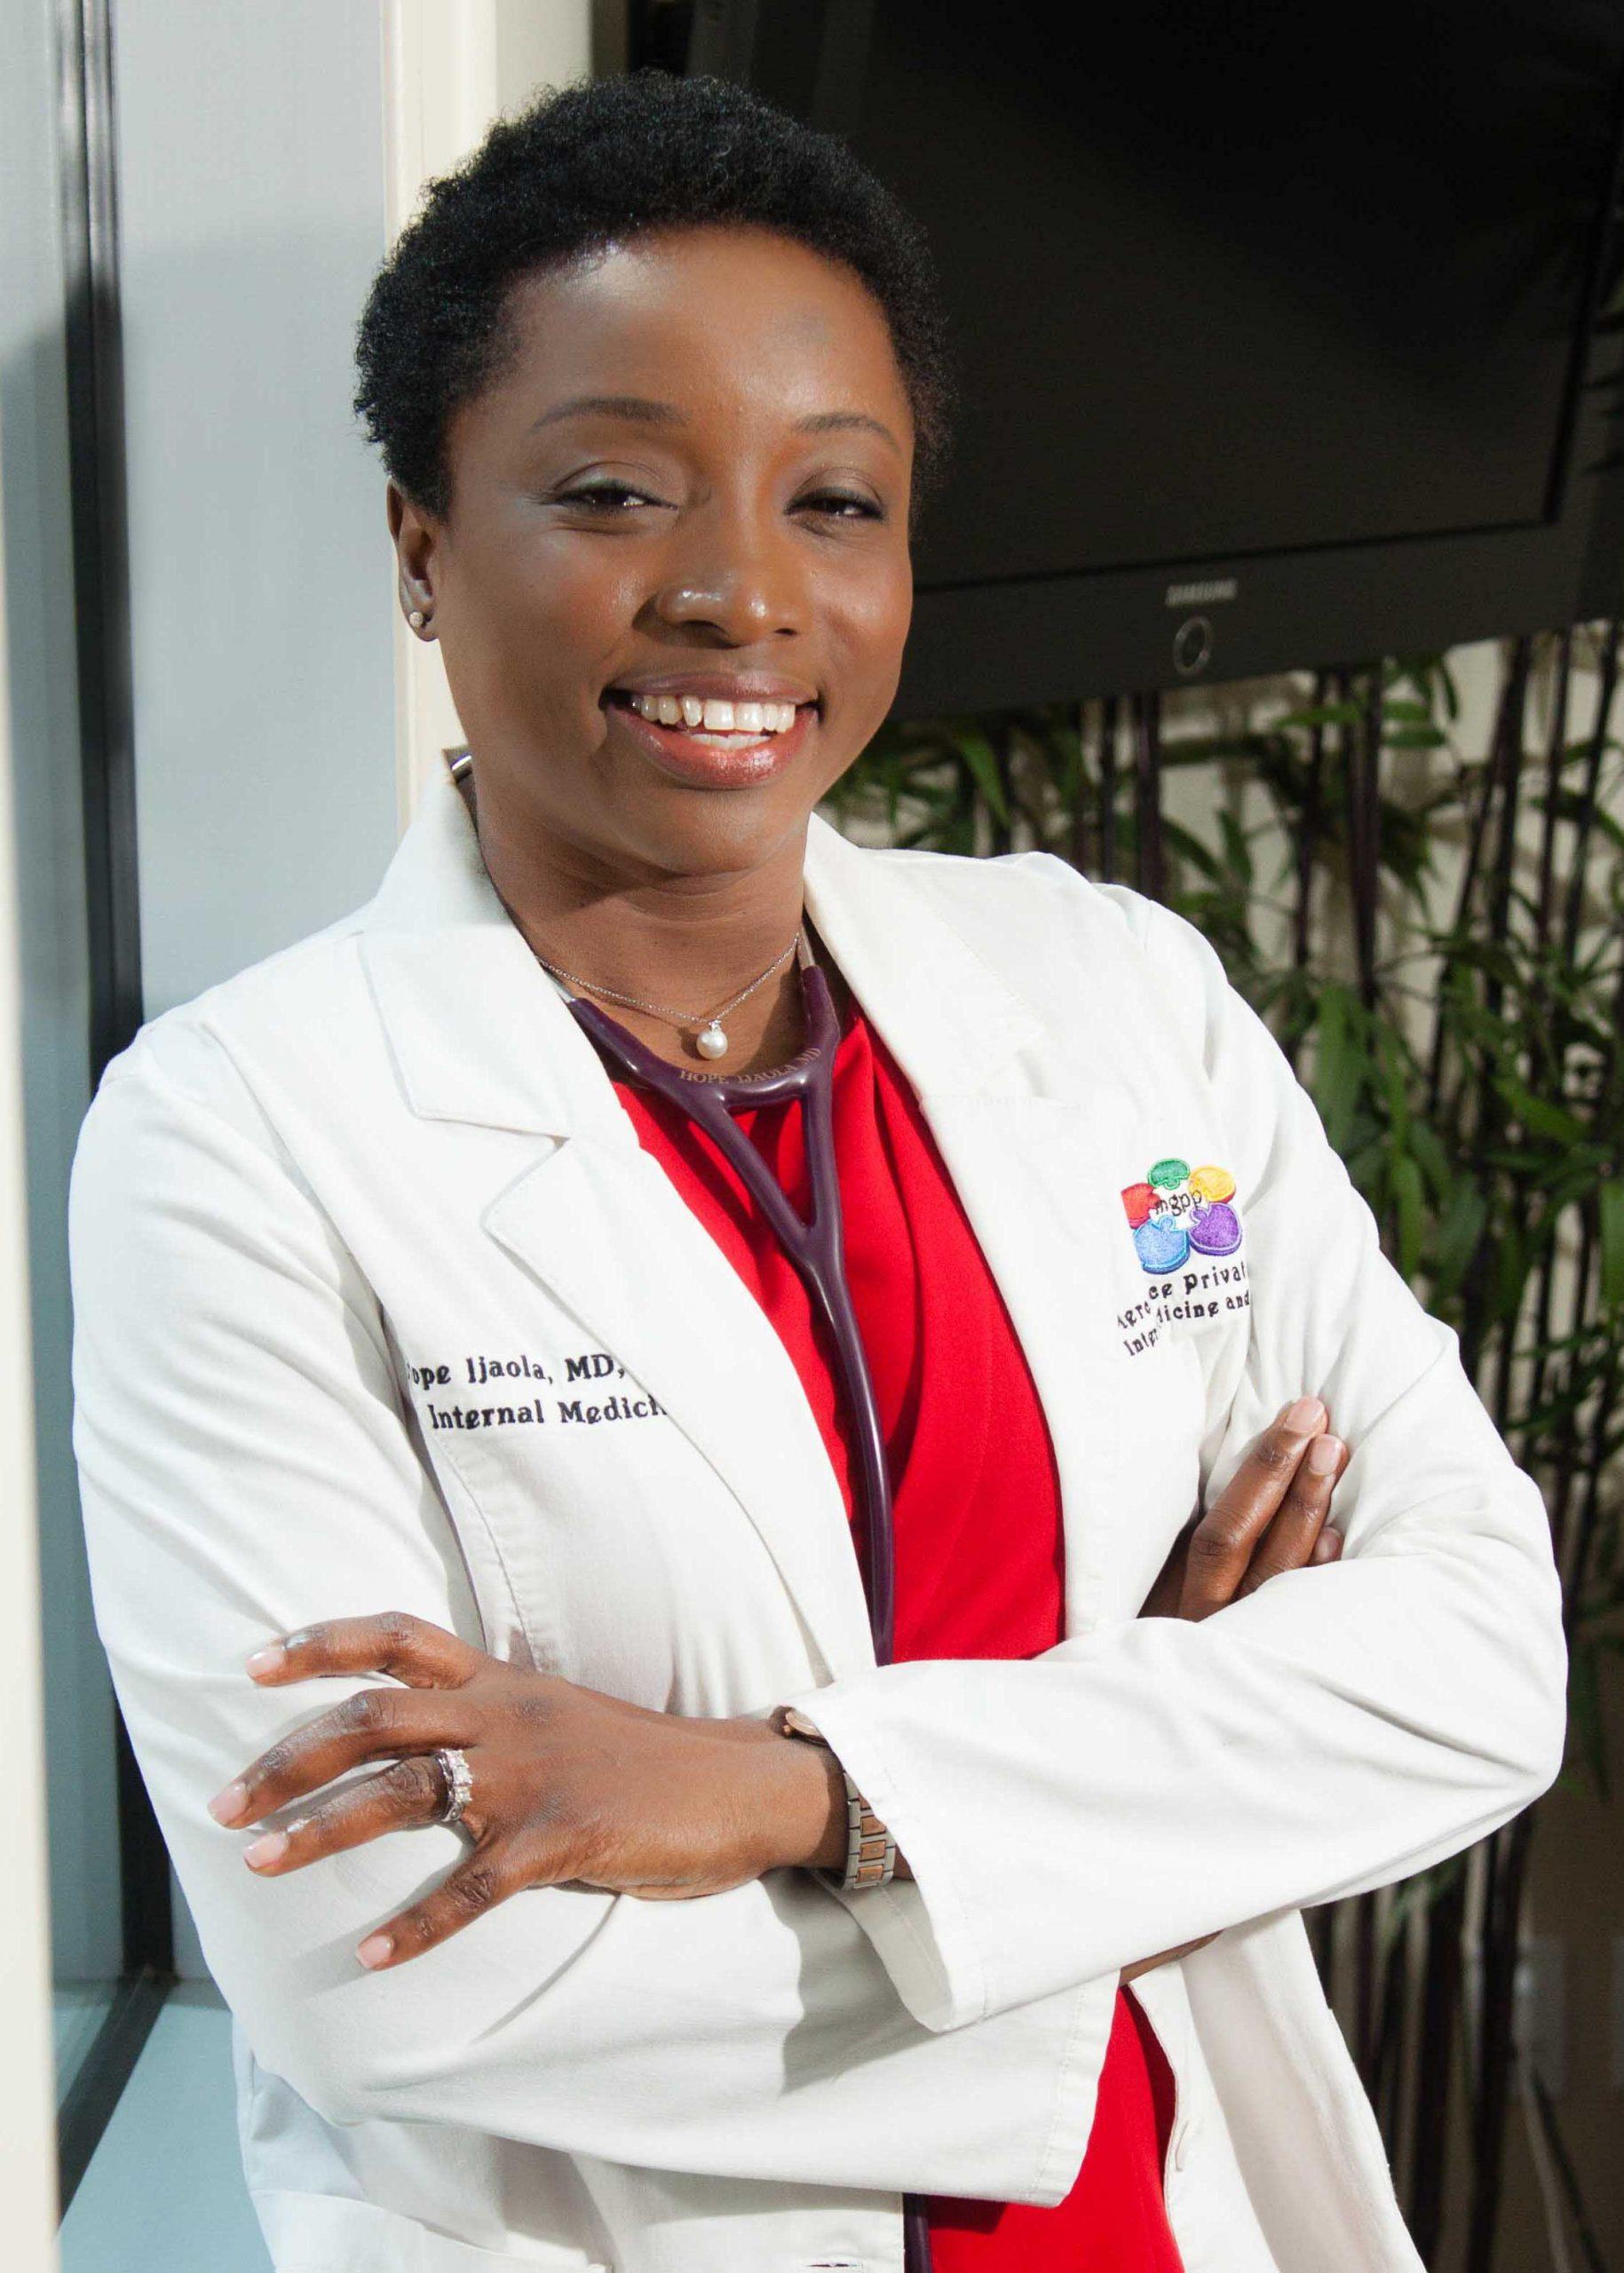 Dr. Hope Ijaola